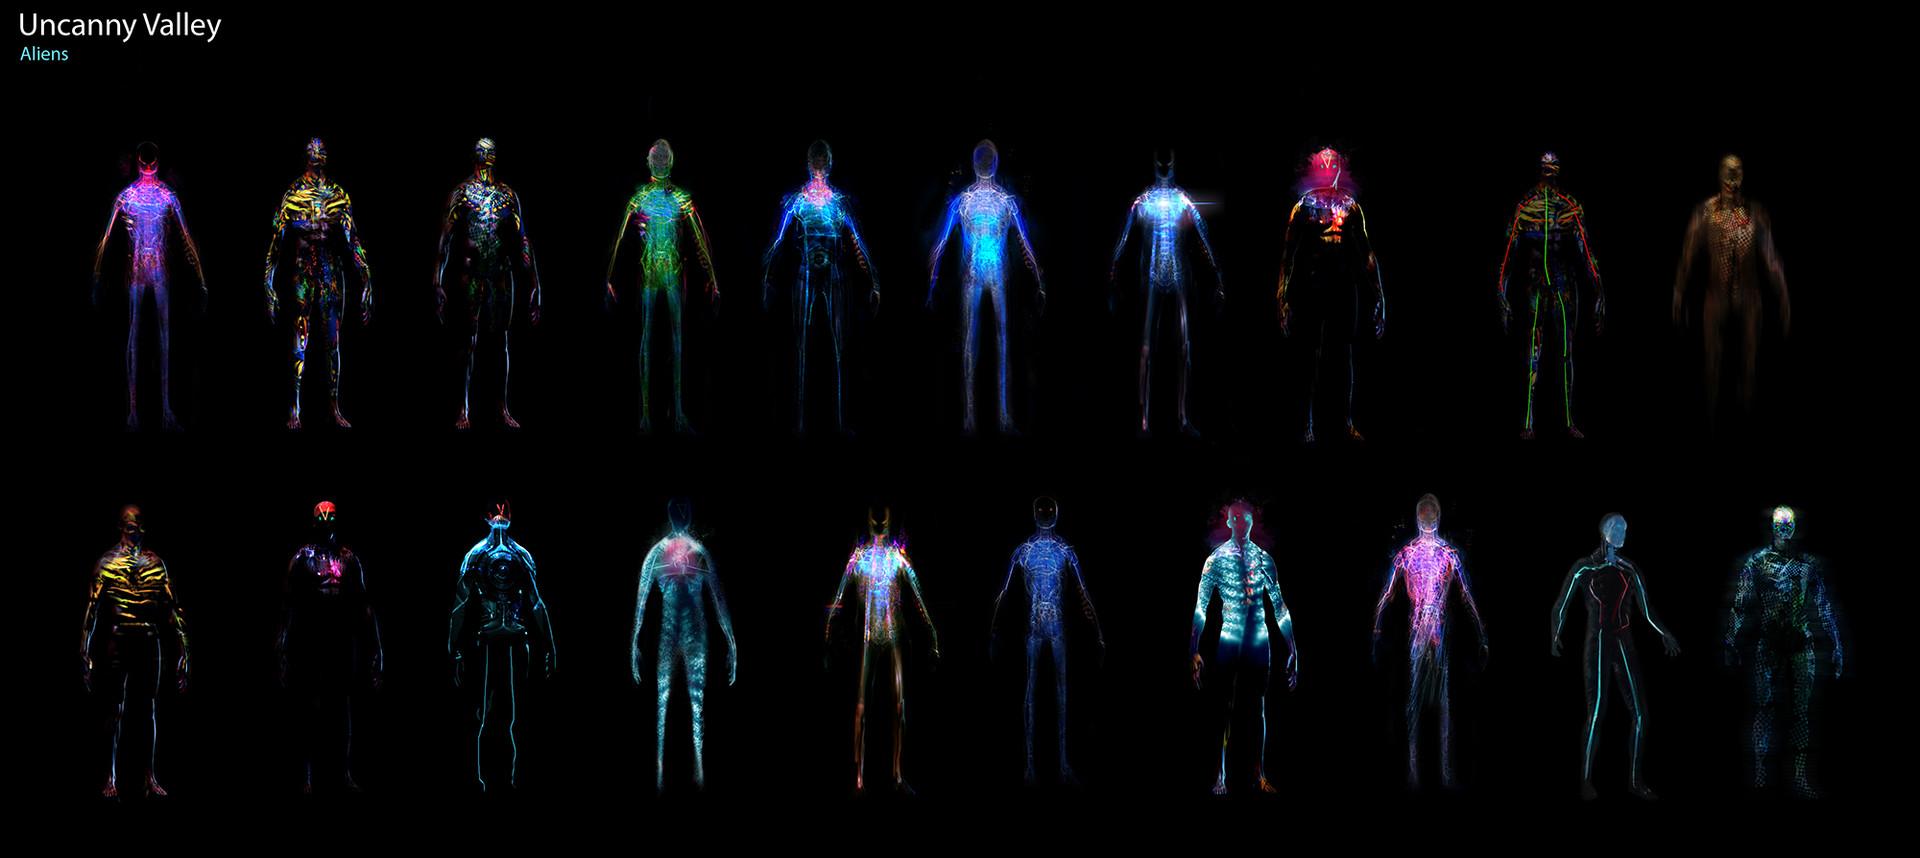 Pablo olivera uncanny valley character design aliens 23 todos baja